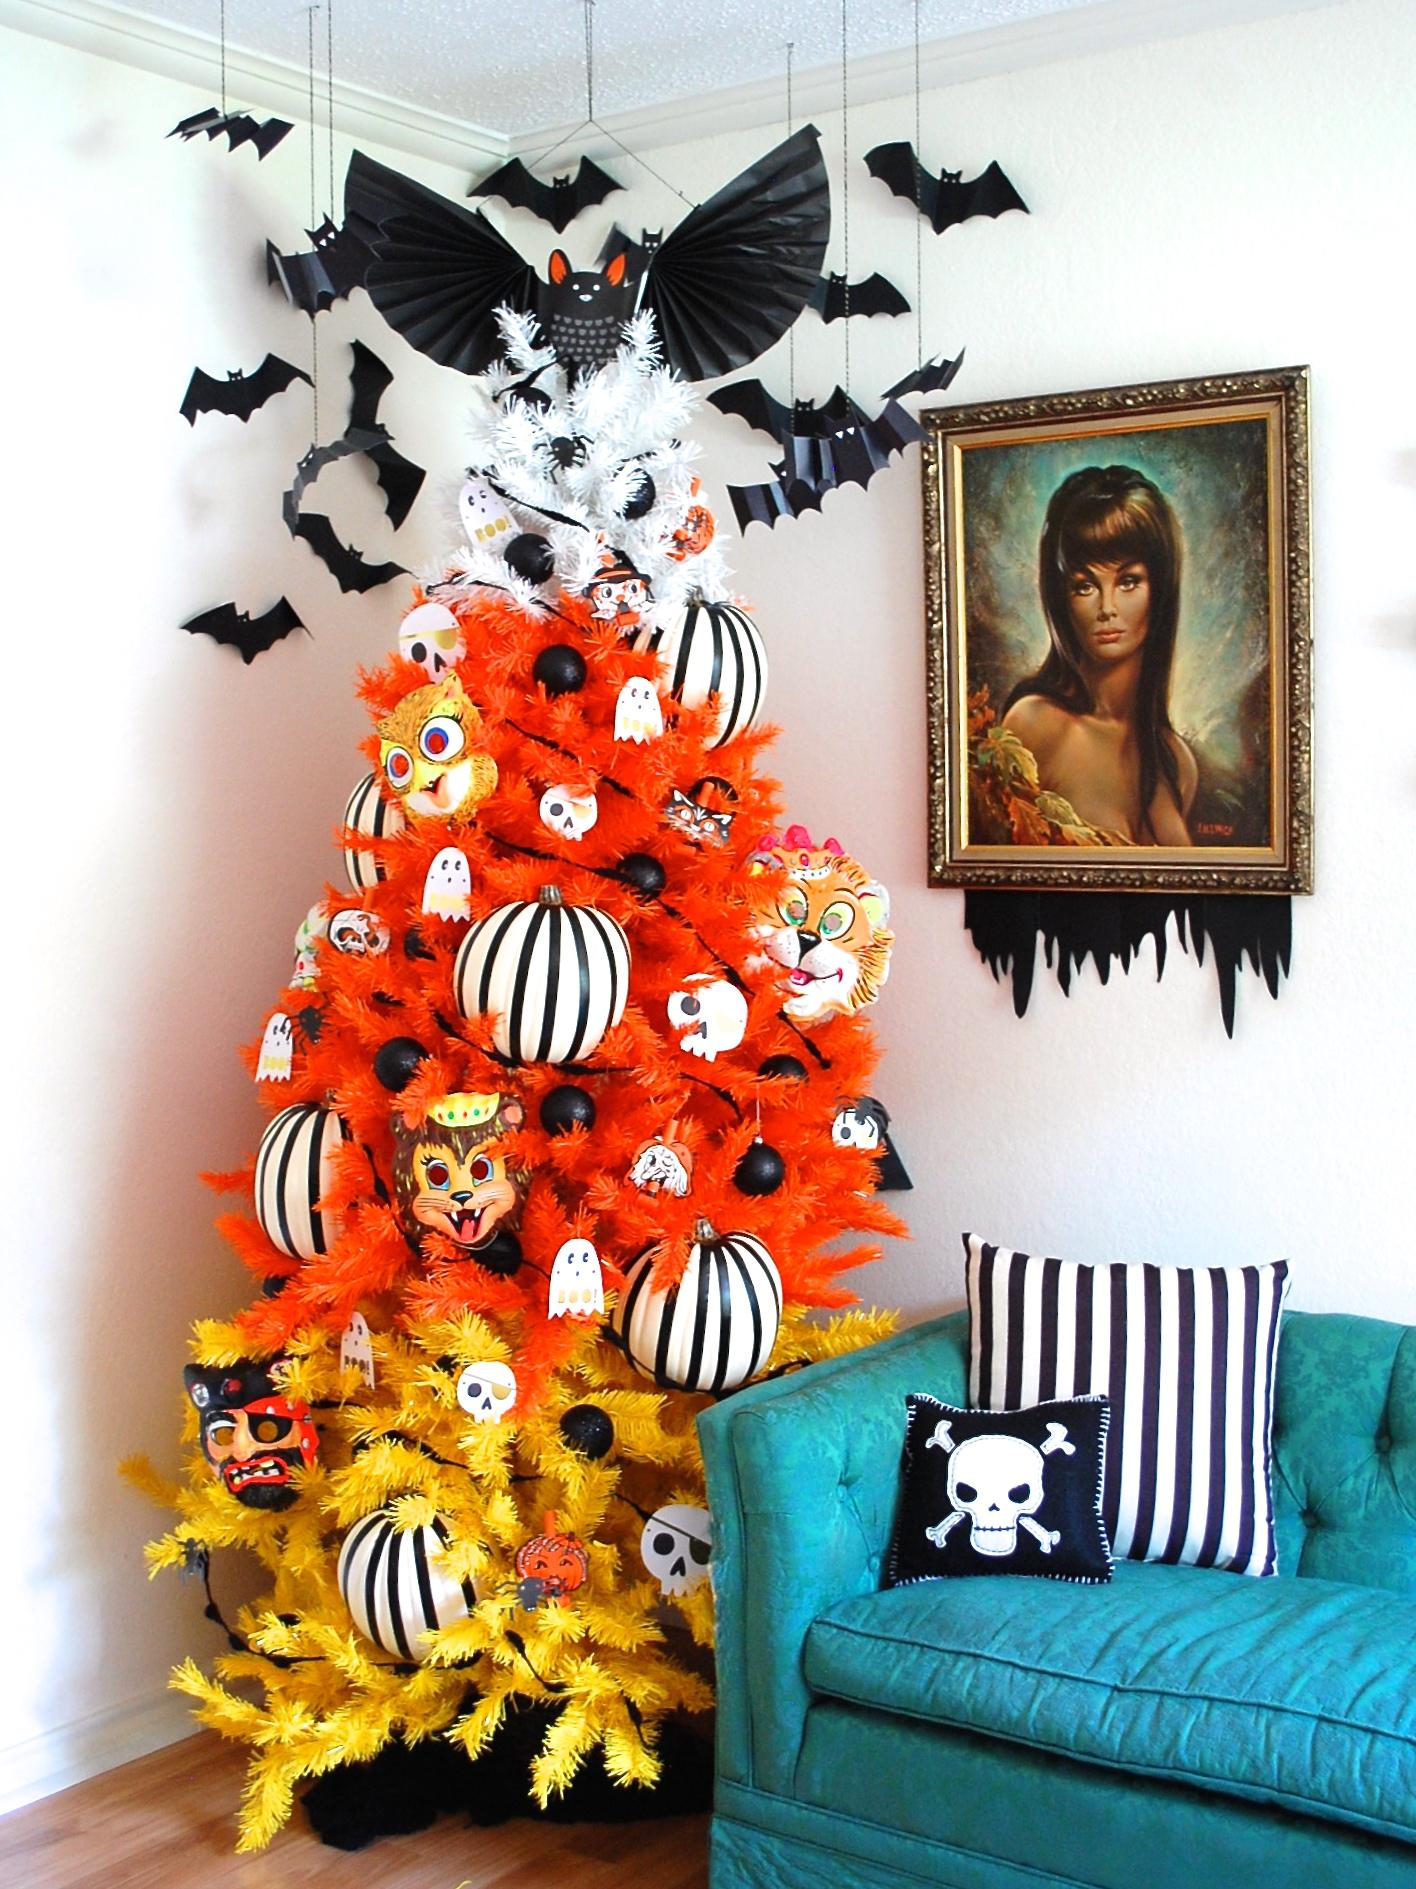 Spooky halloween tree decoration - Spooky Halloween Tree Decoration